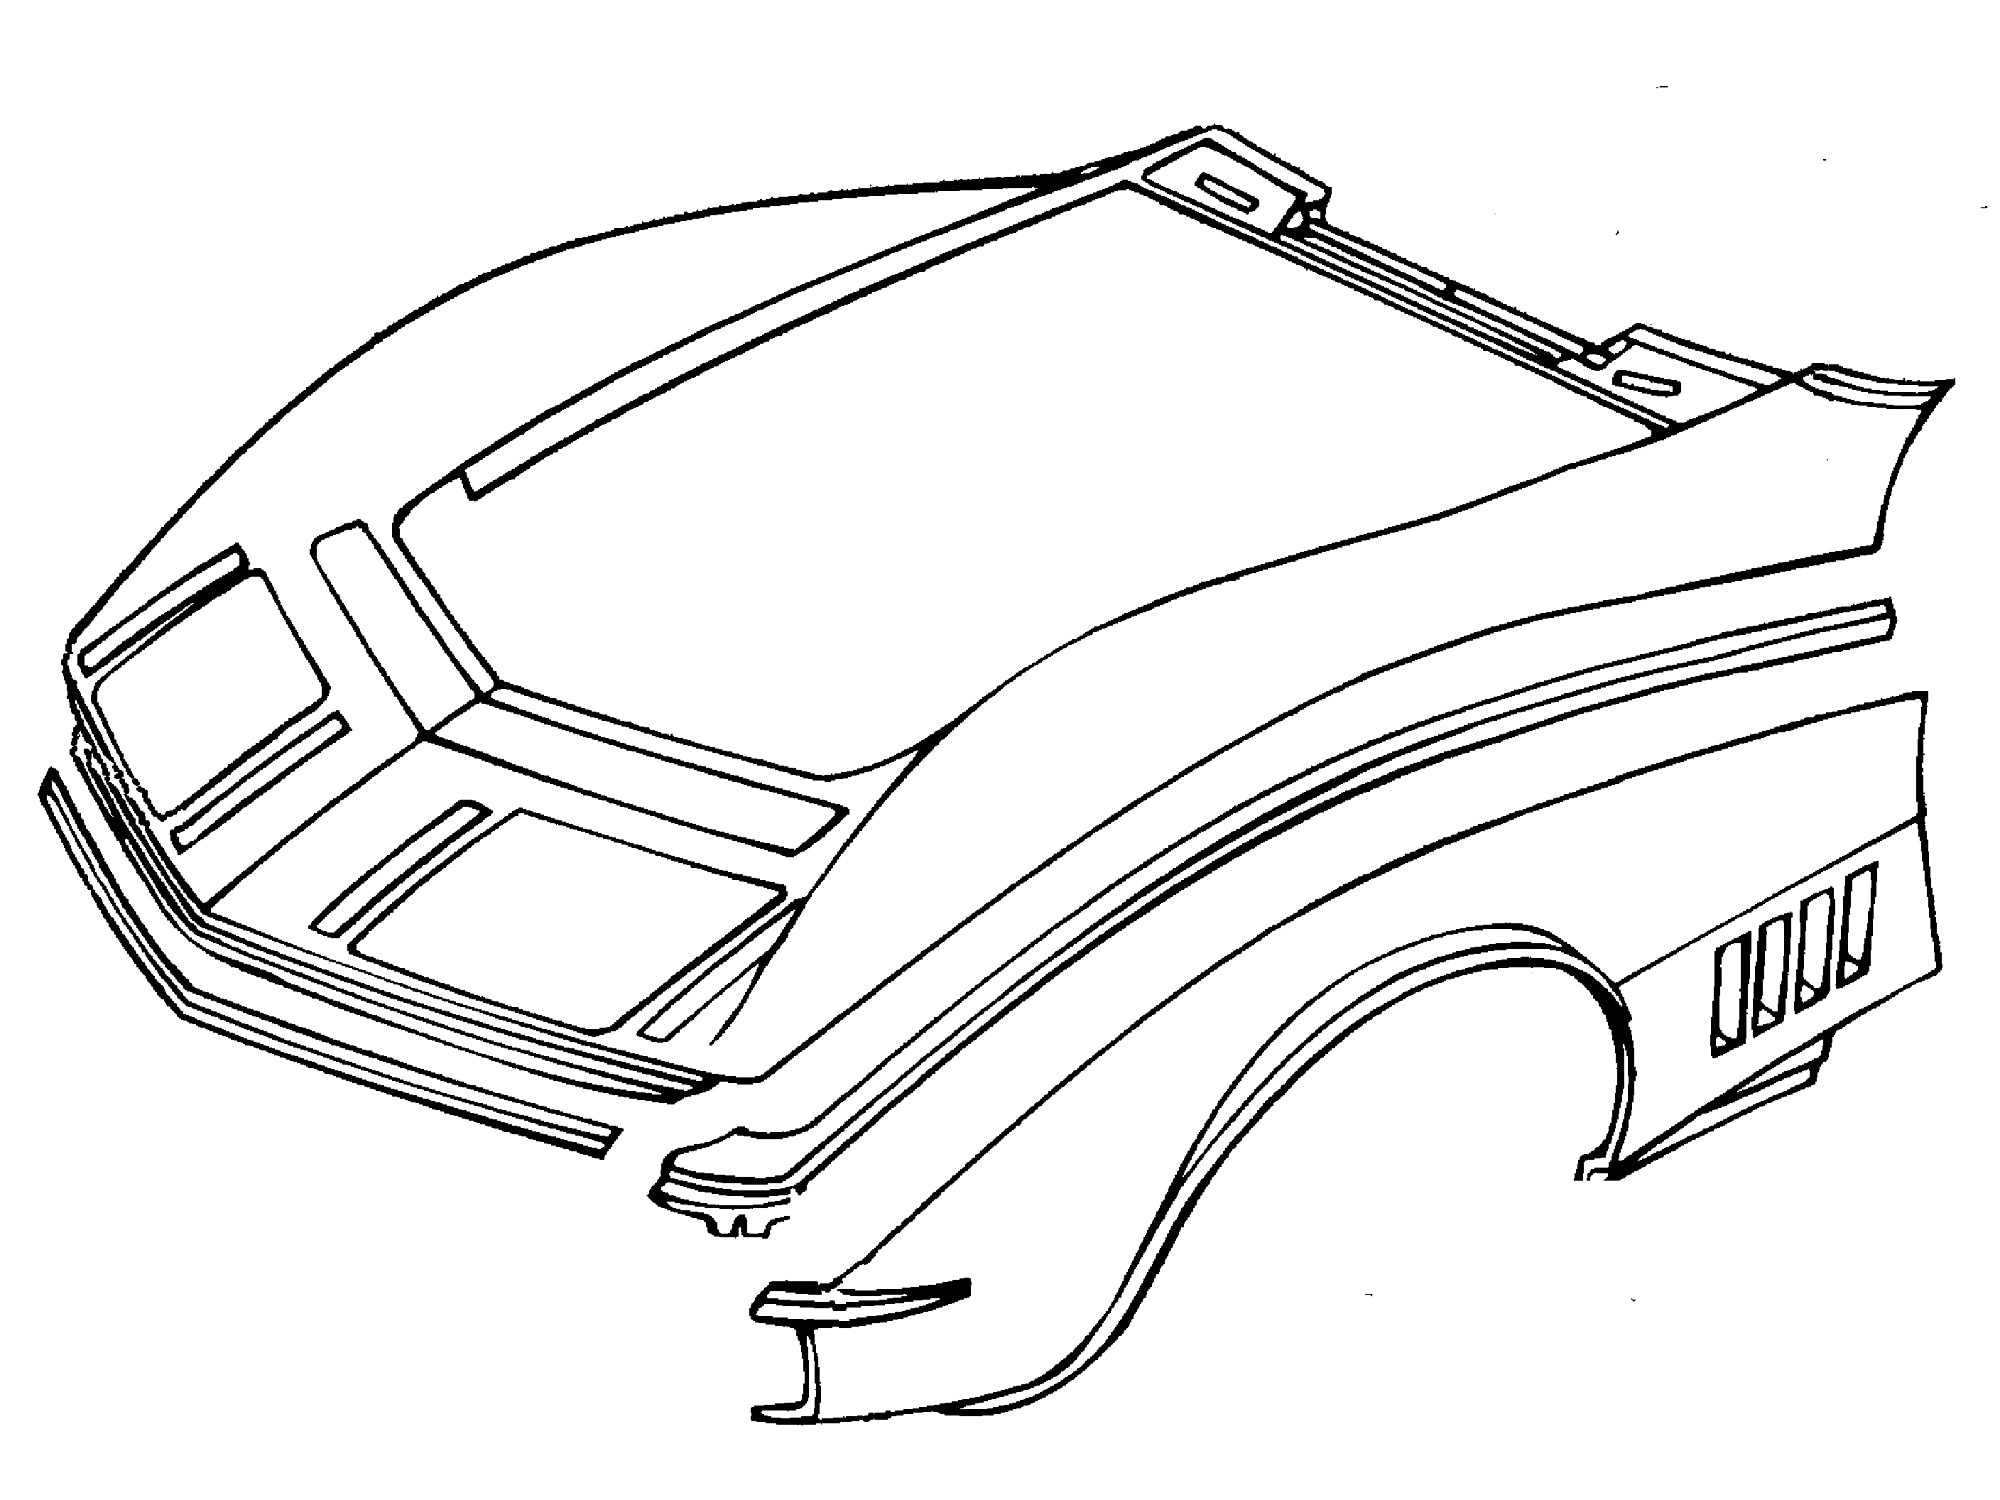 Repairing Your Corvette S Minor Fiberglass Damage